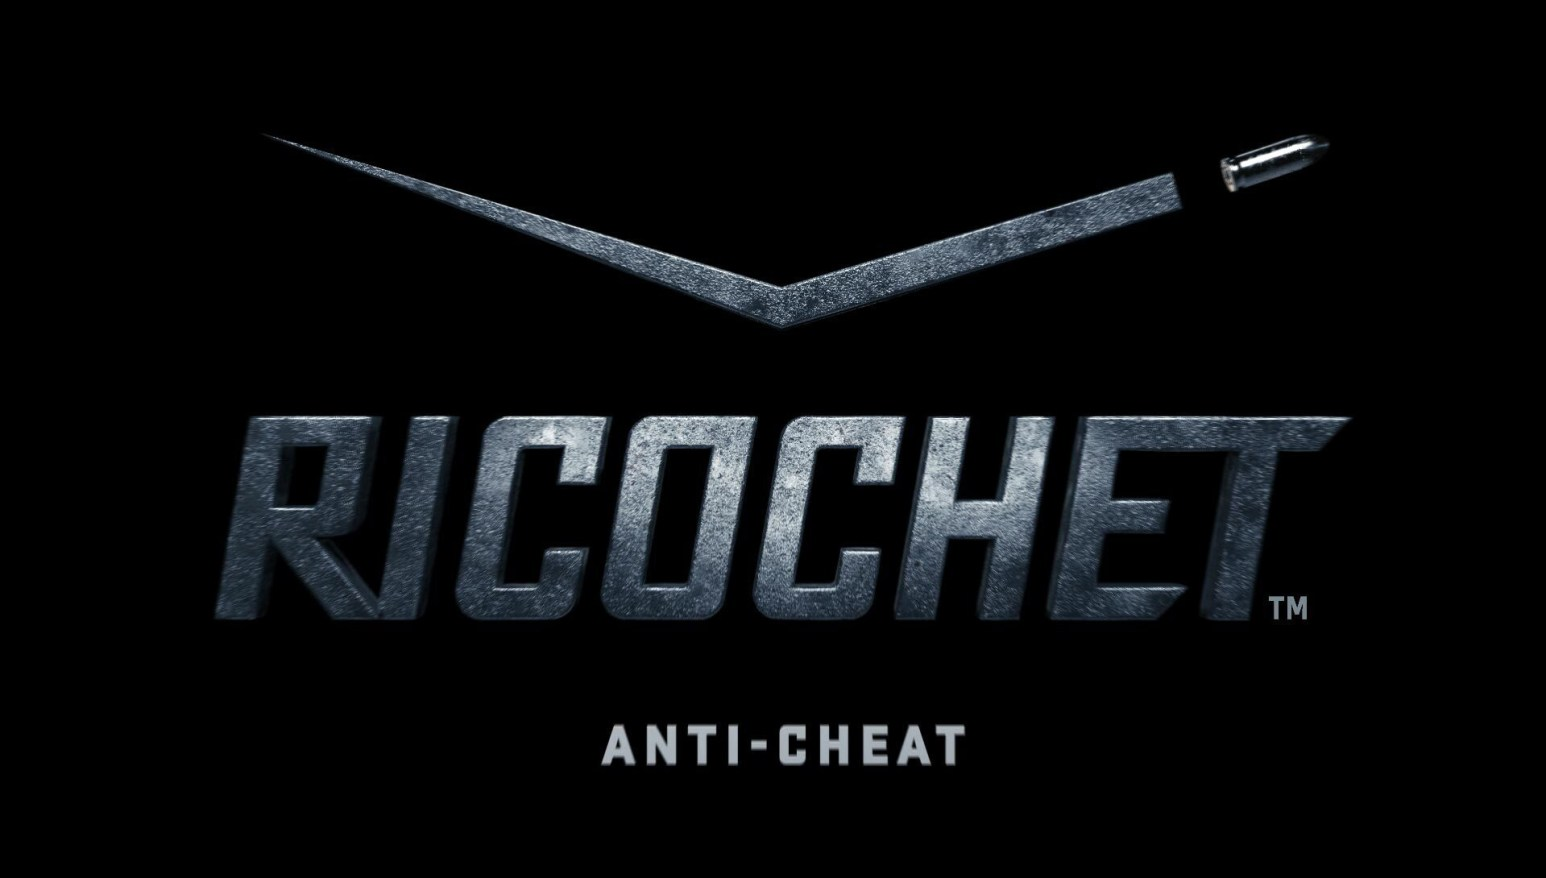 RICOCHET Anti-Cheat